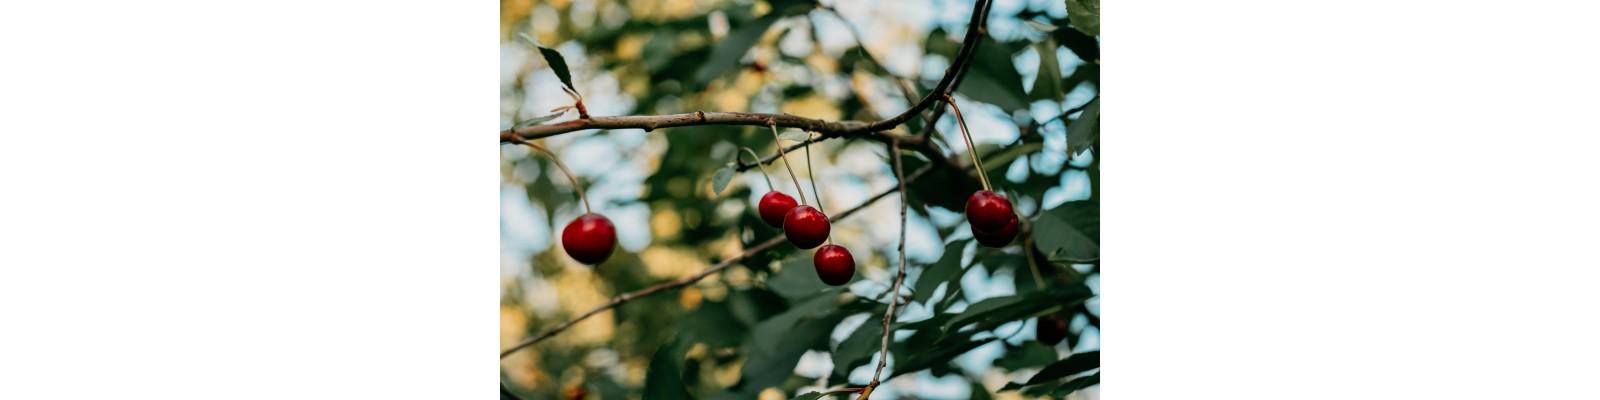 Antracnoza sau patarea purpurie (blumeriela jaapi) la pomii fructiferi